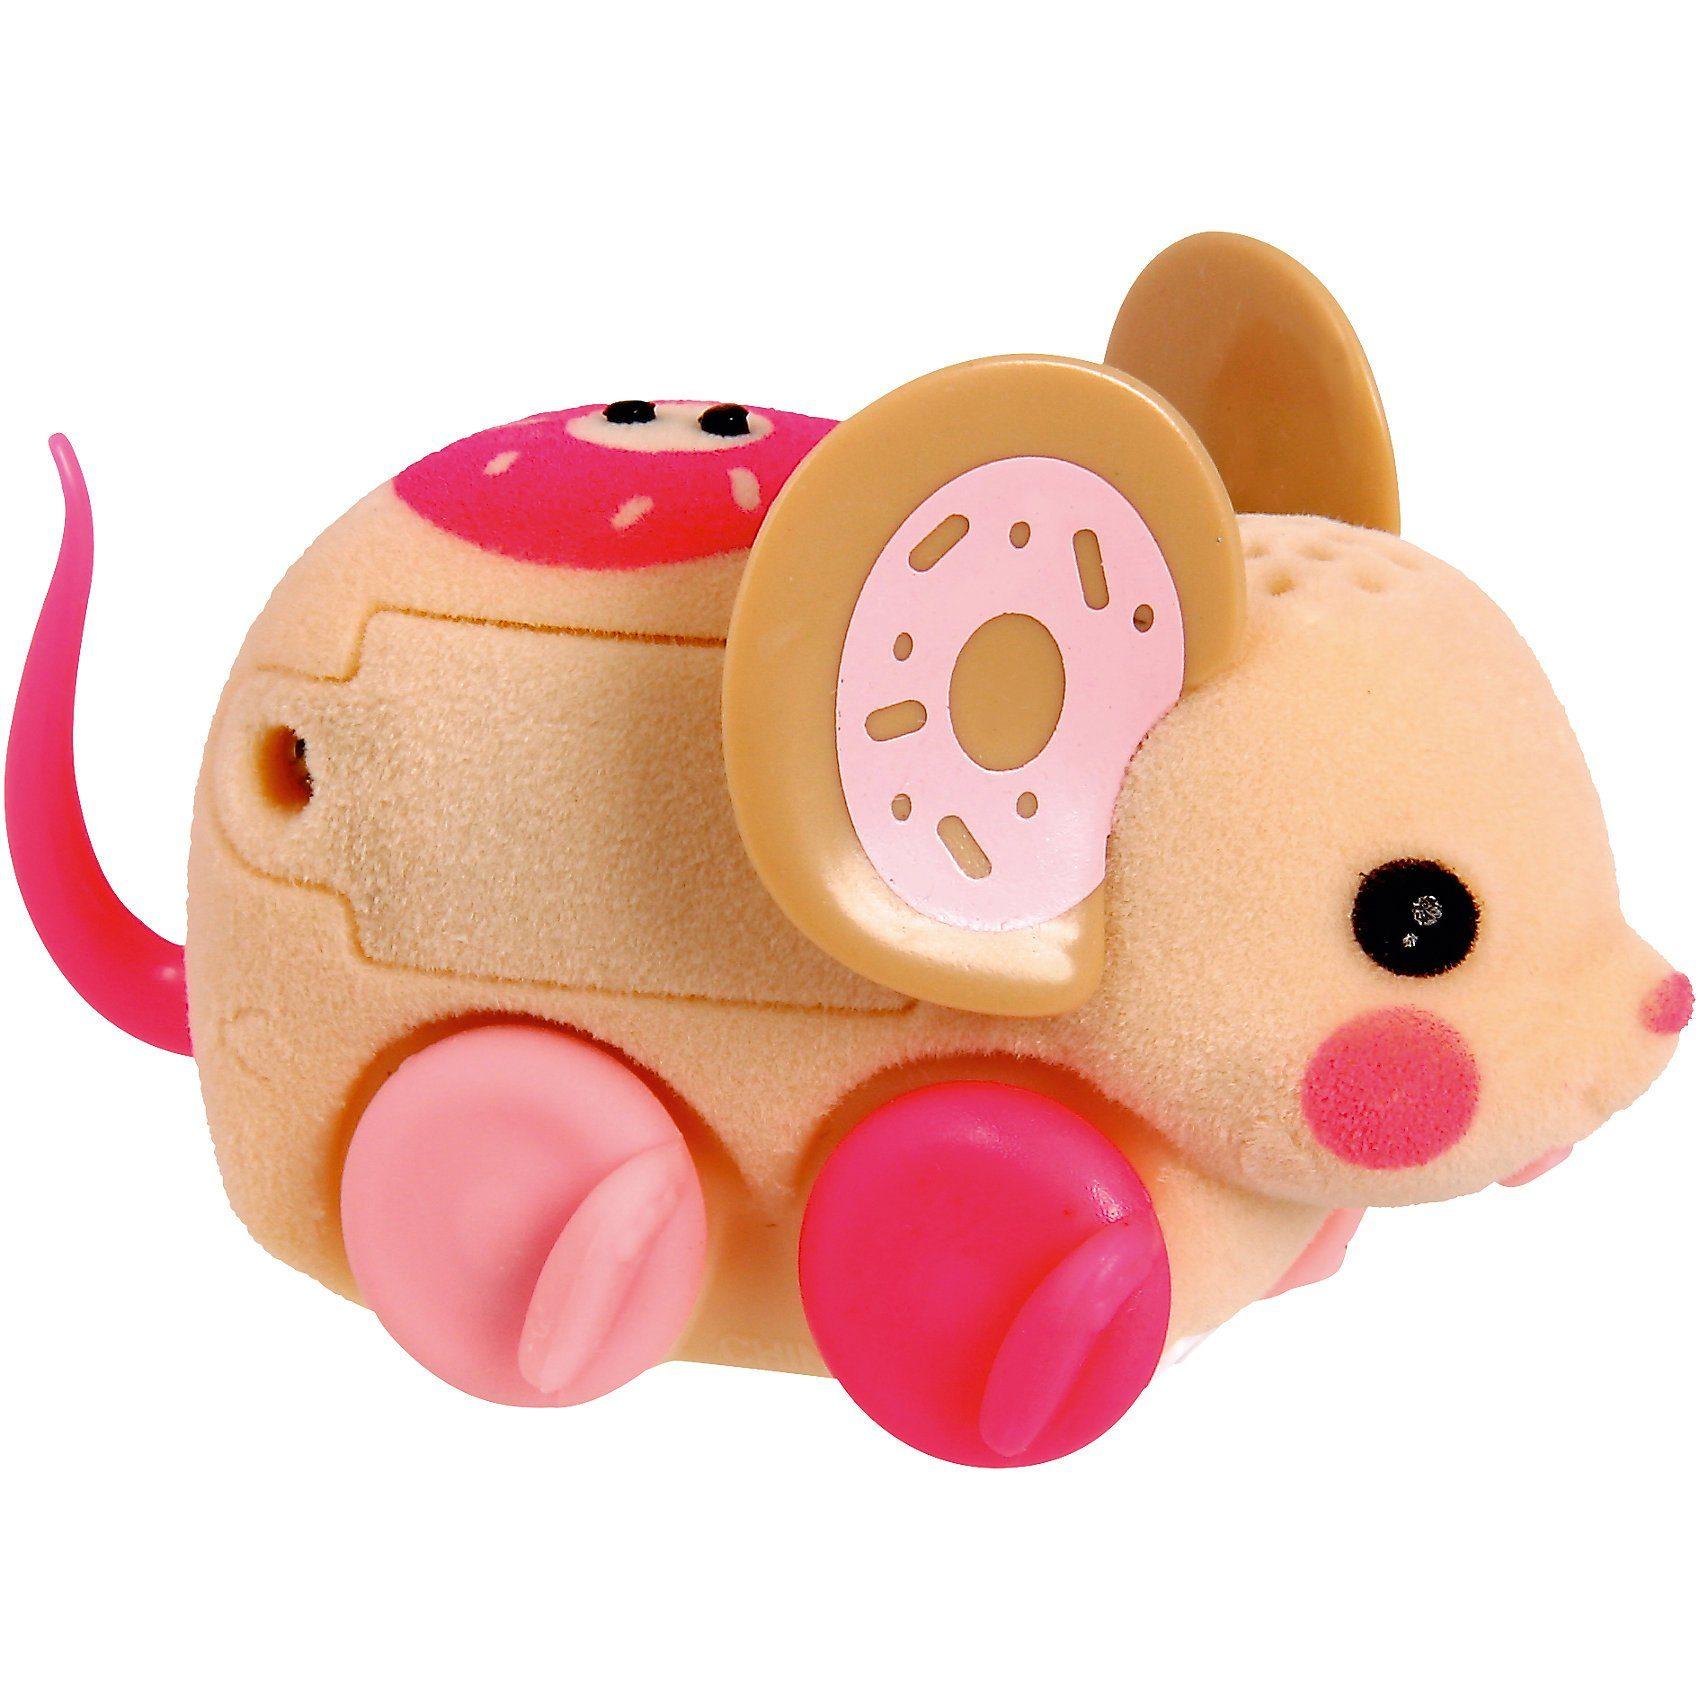 BOTI Little Live Pets 33909 Maus Bronut